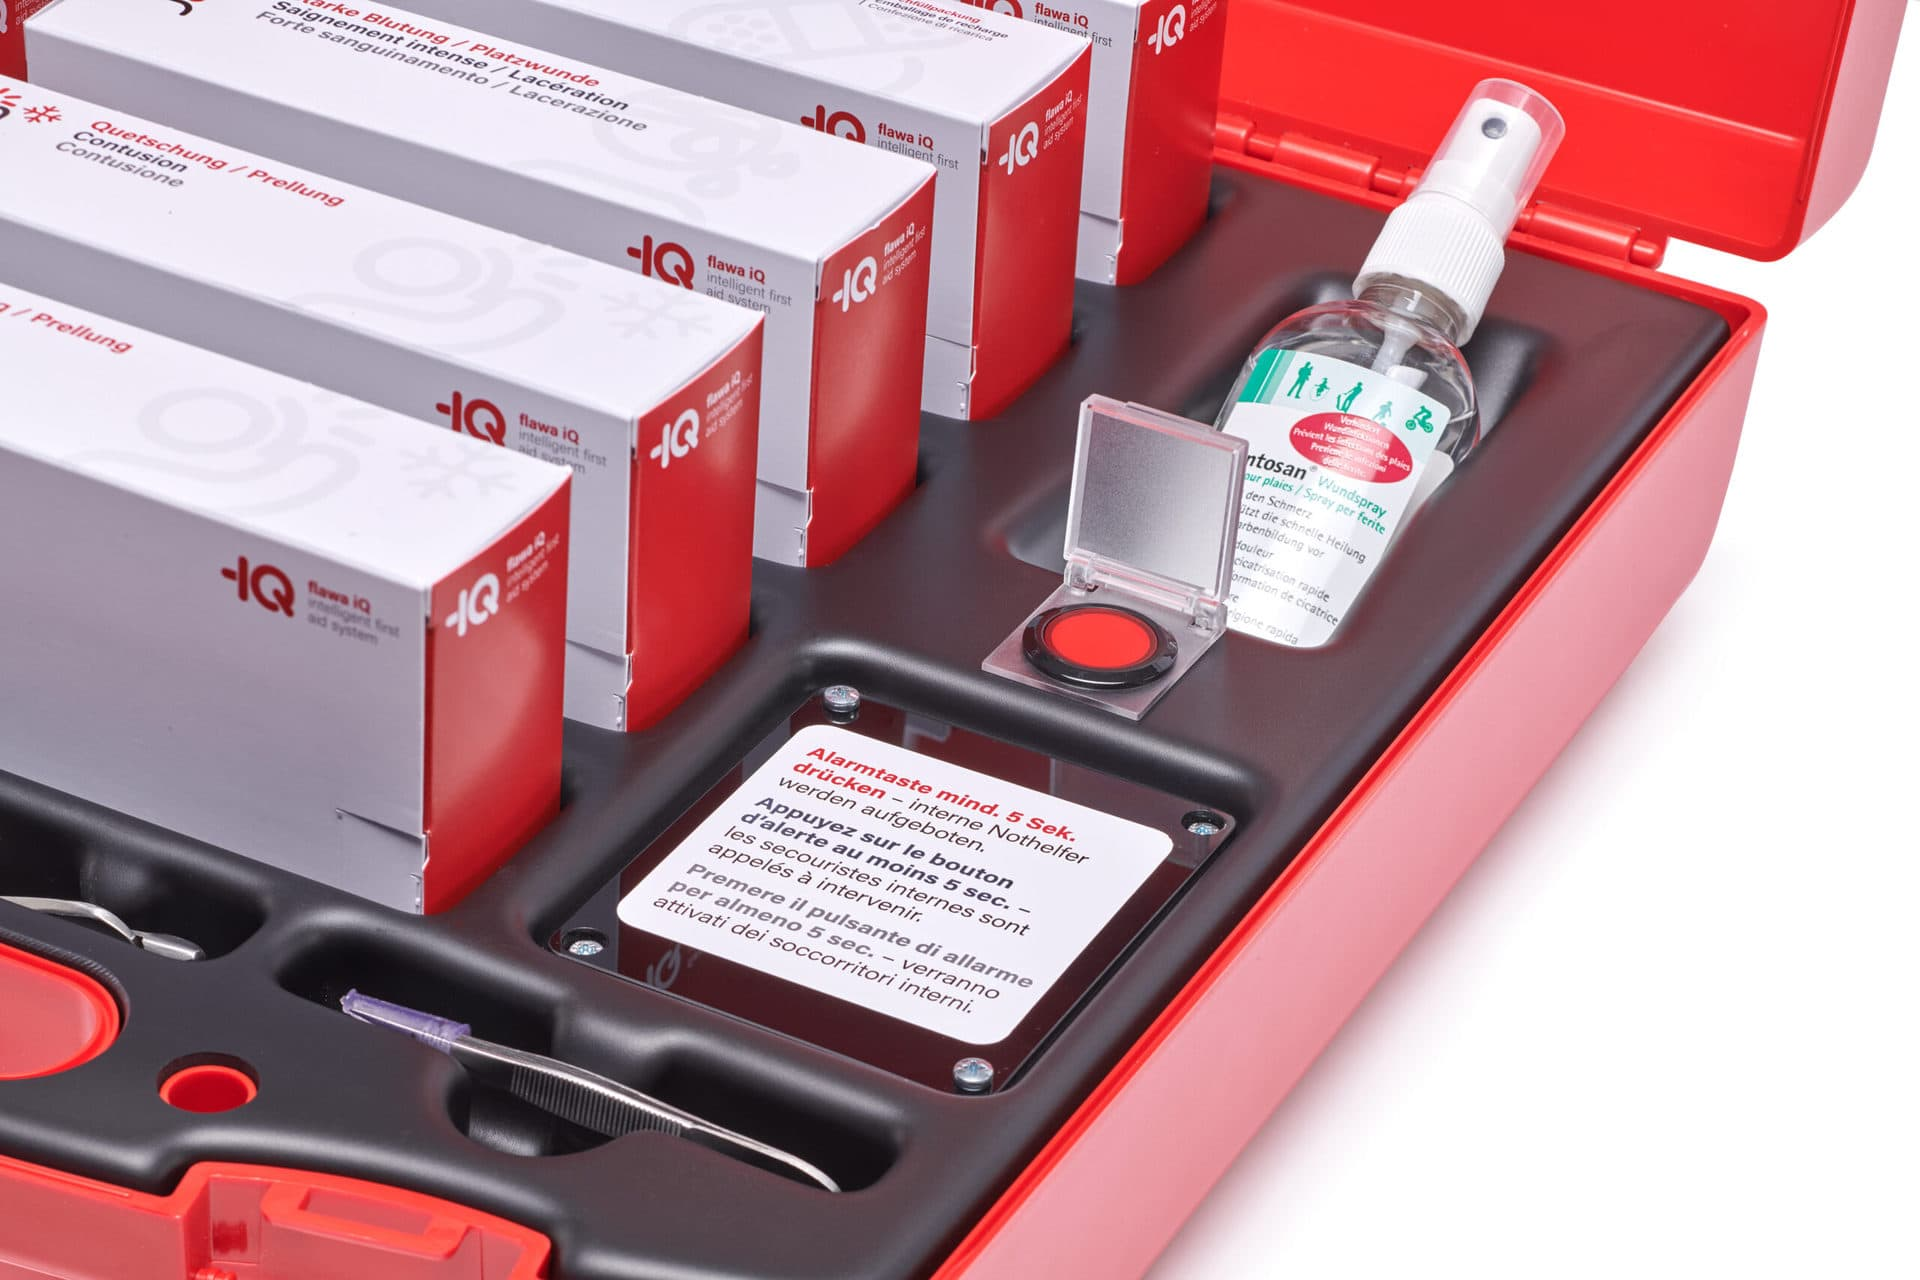 integrierter Alarmknopf im flawa iQ Notfallkoffer